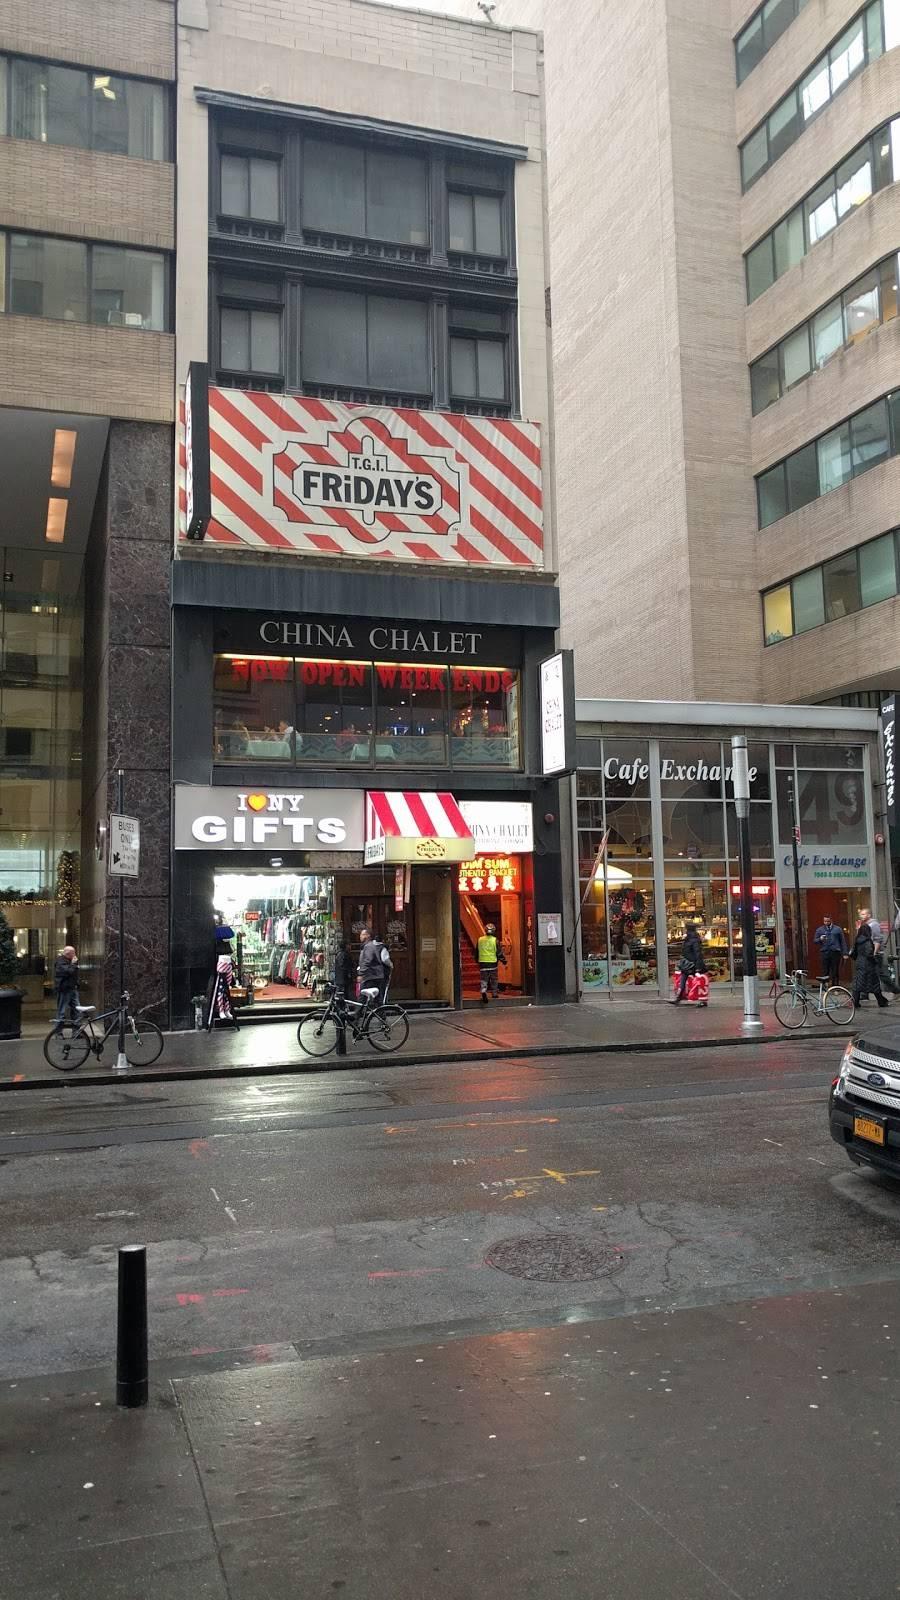 China Chalet | restaurant | 47 Broadway, New York, NY 10006, USA | 2129434380 OR +1 212-943-4380